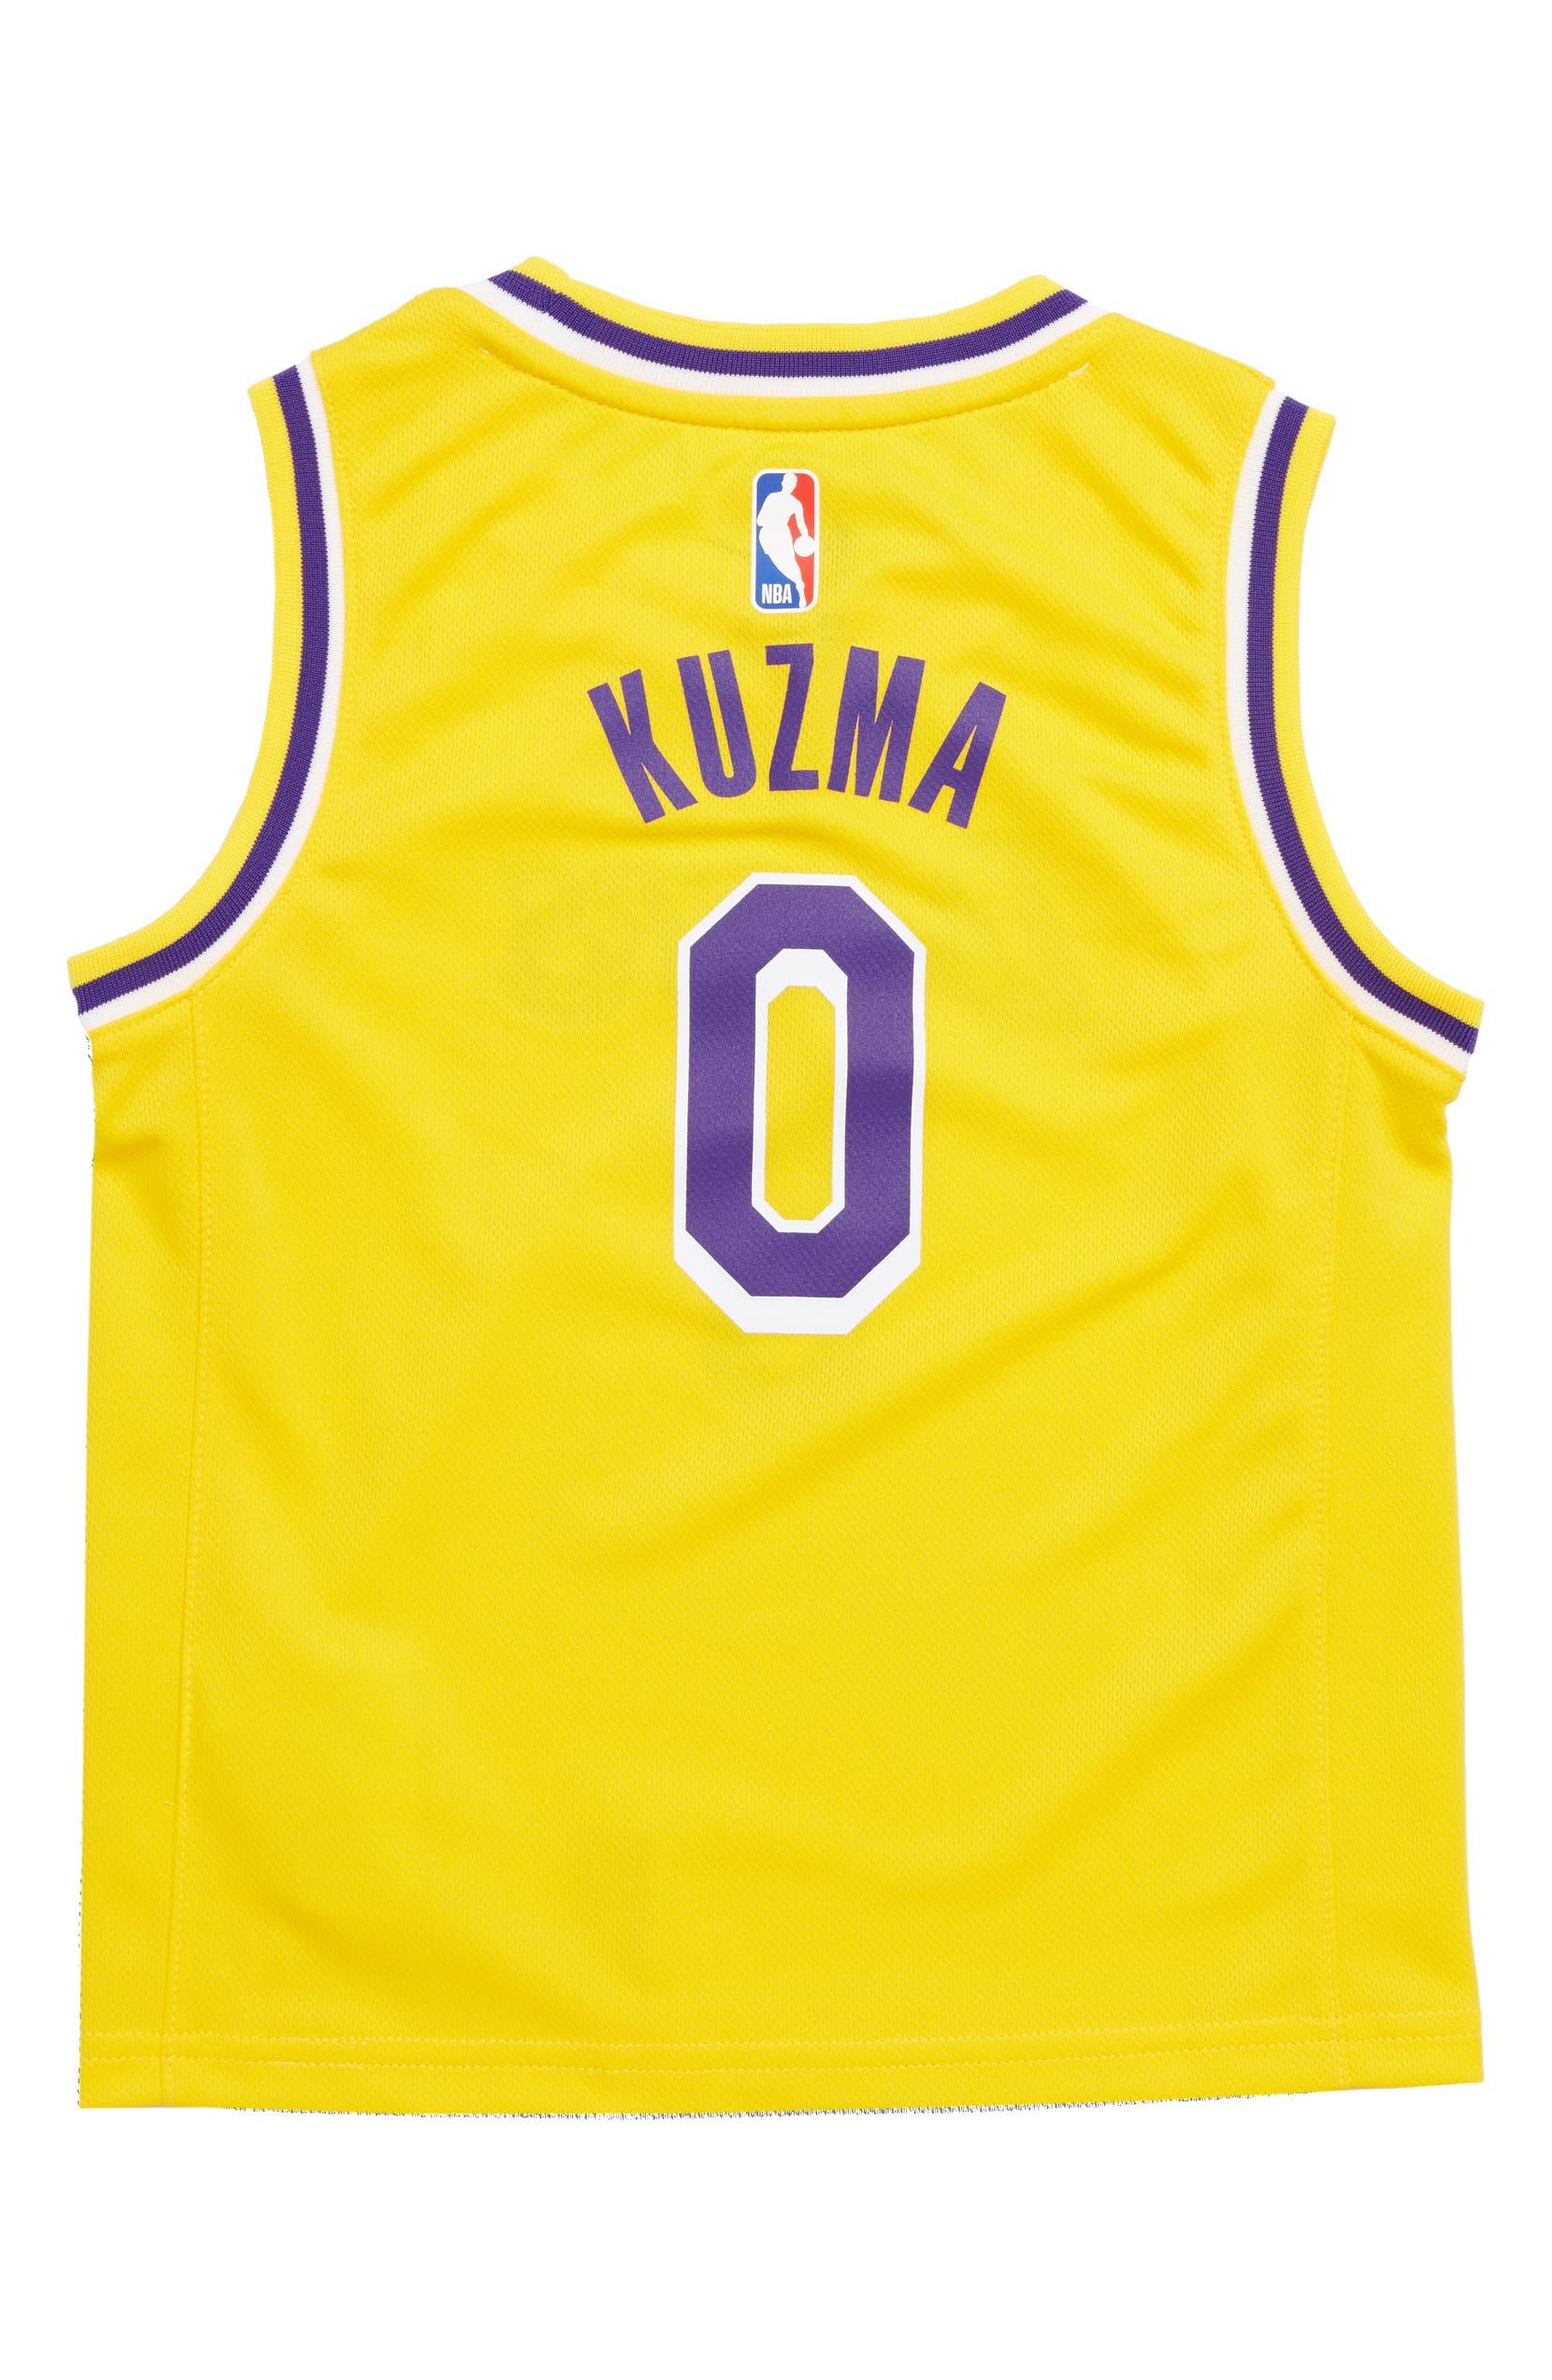 premium selection b18a1 979a8 NBA Logo Los Angeles Lakers Kyle Kuzma Basketball Jersey